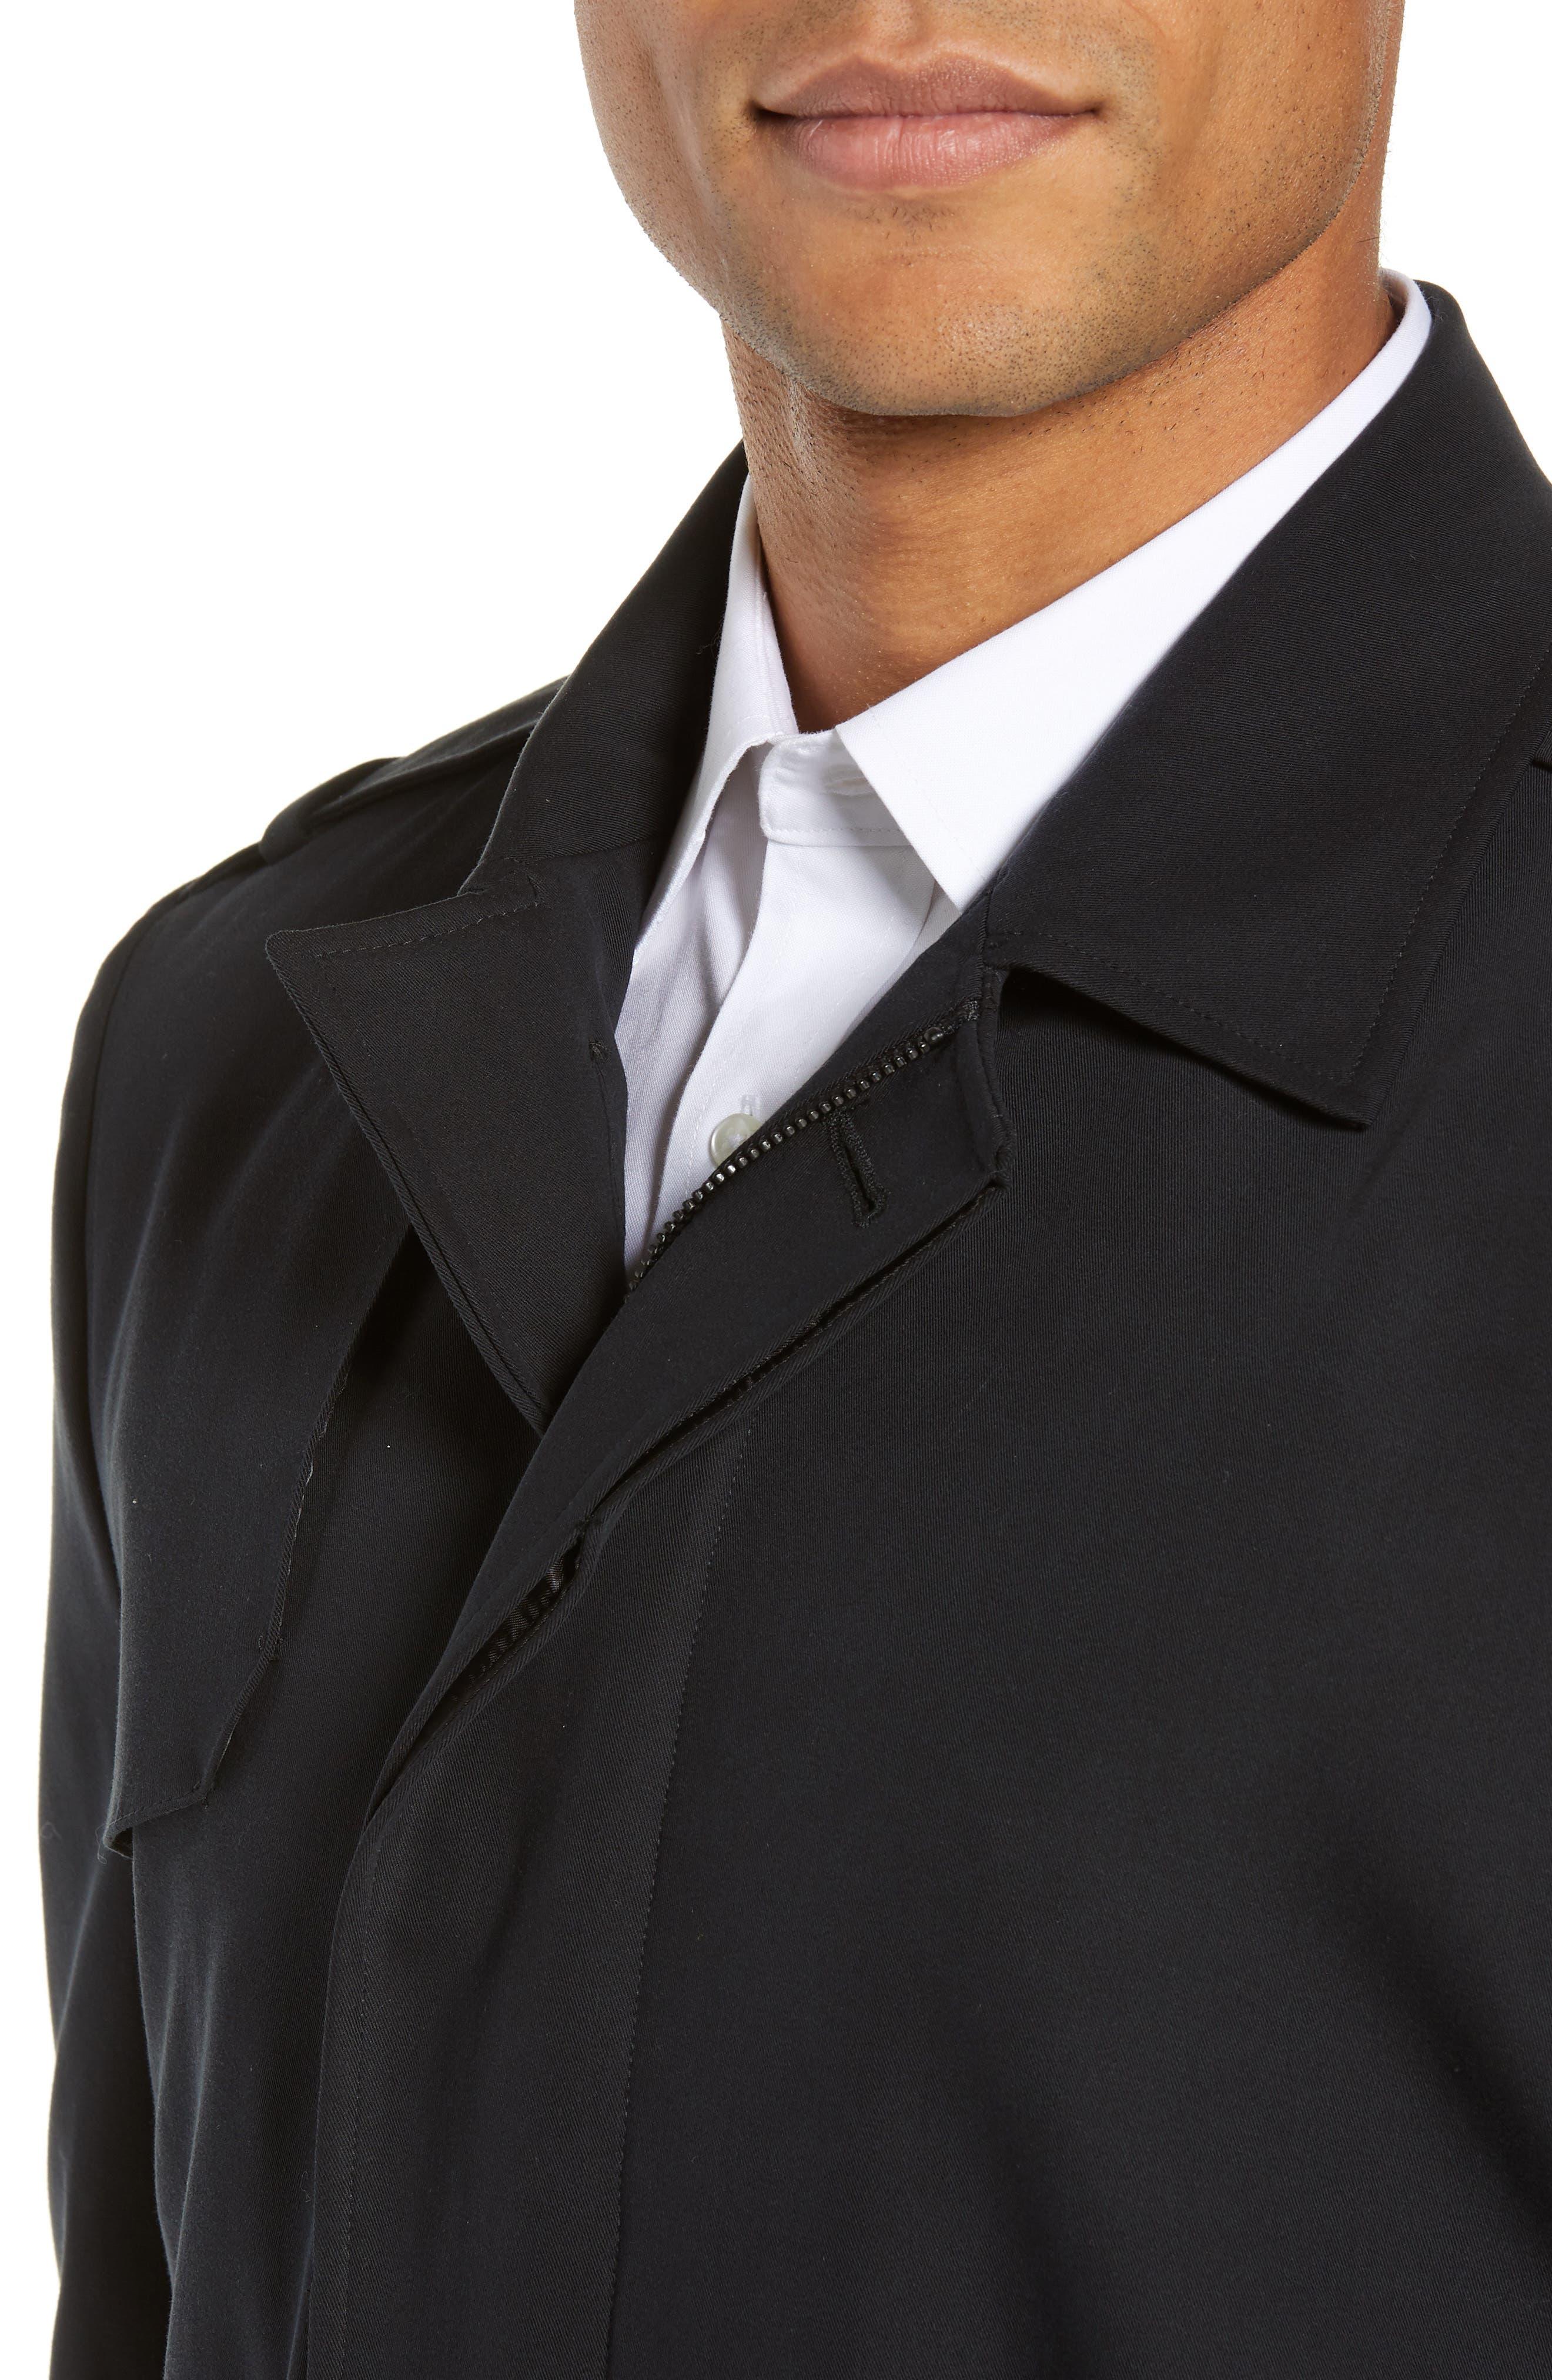 Clean Short Trench Coat,                             Alternate thumbnail 4, color,                             BLACK